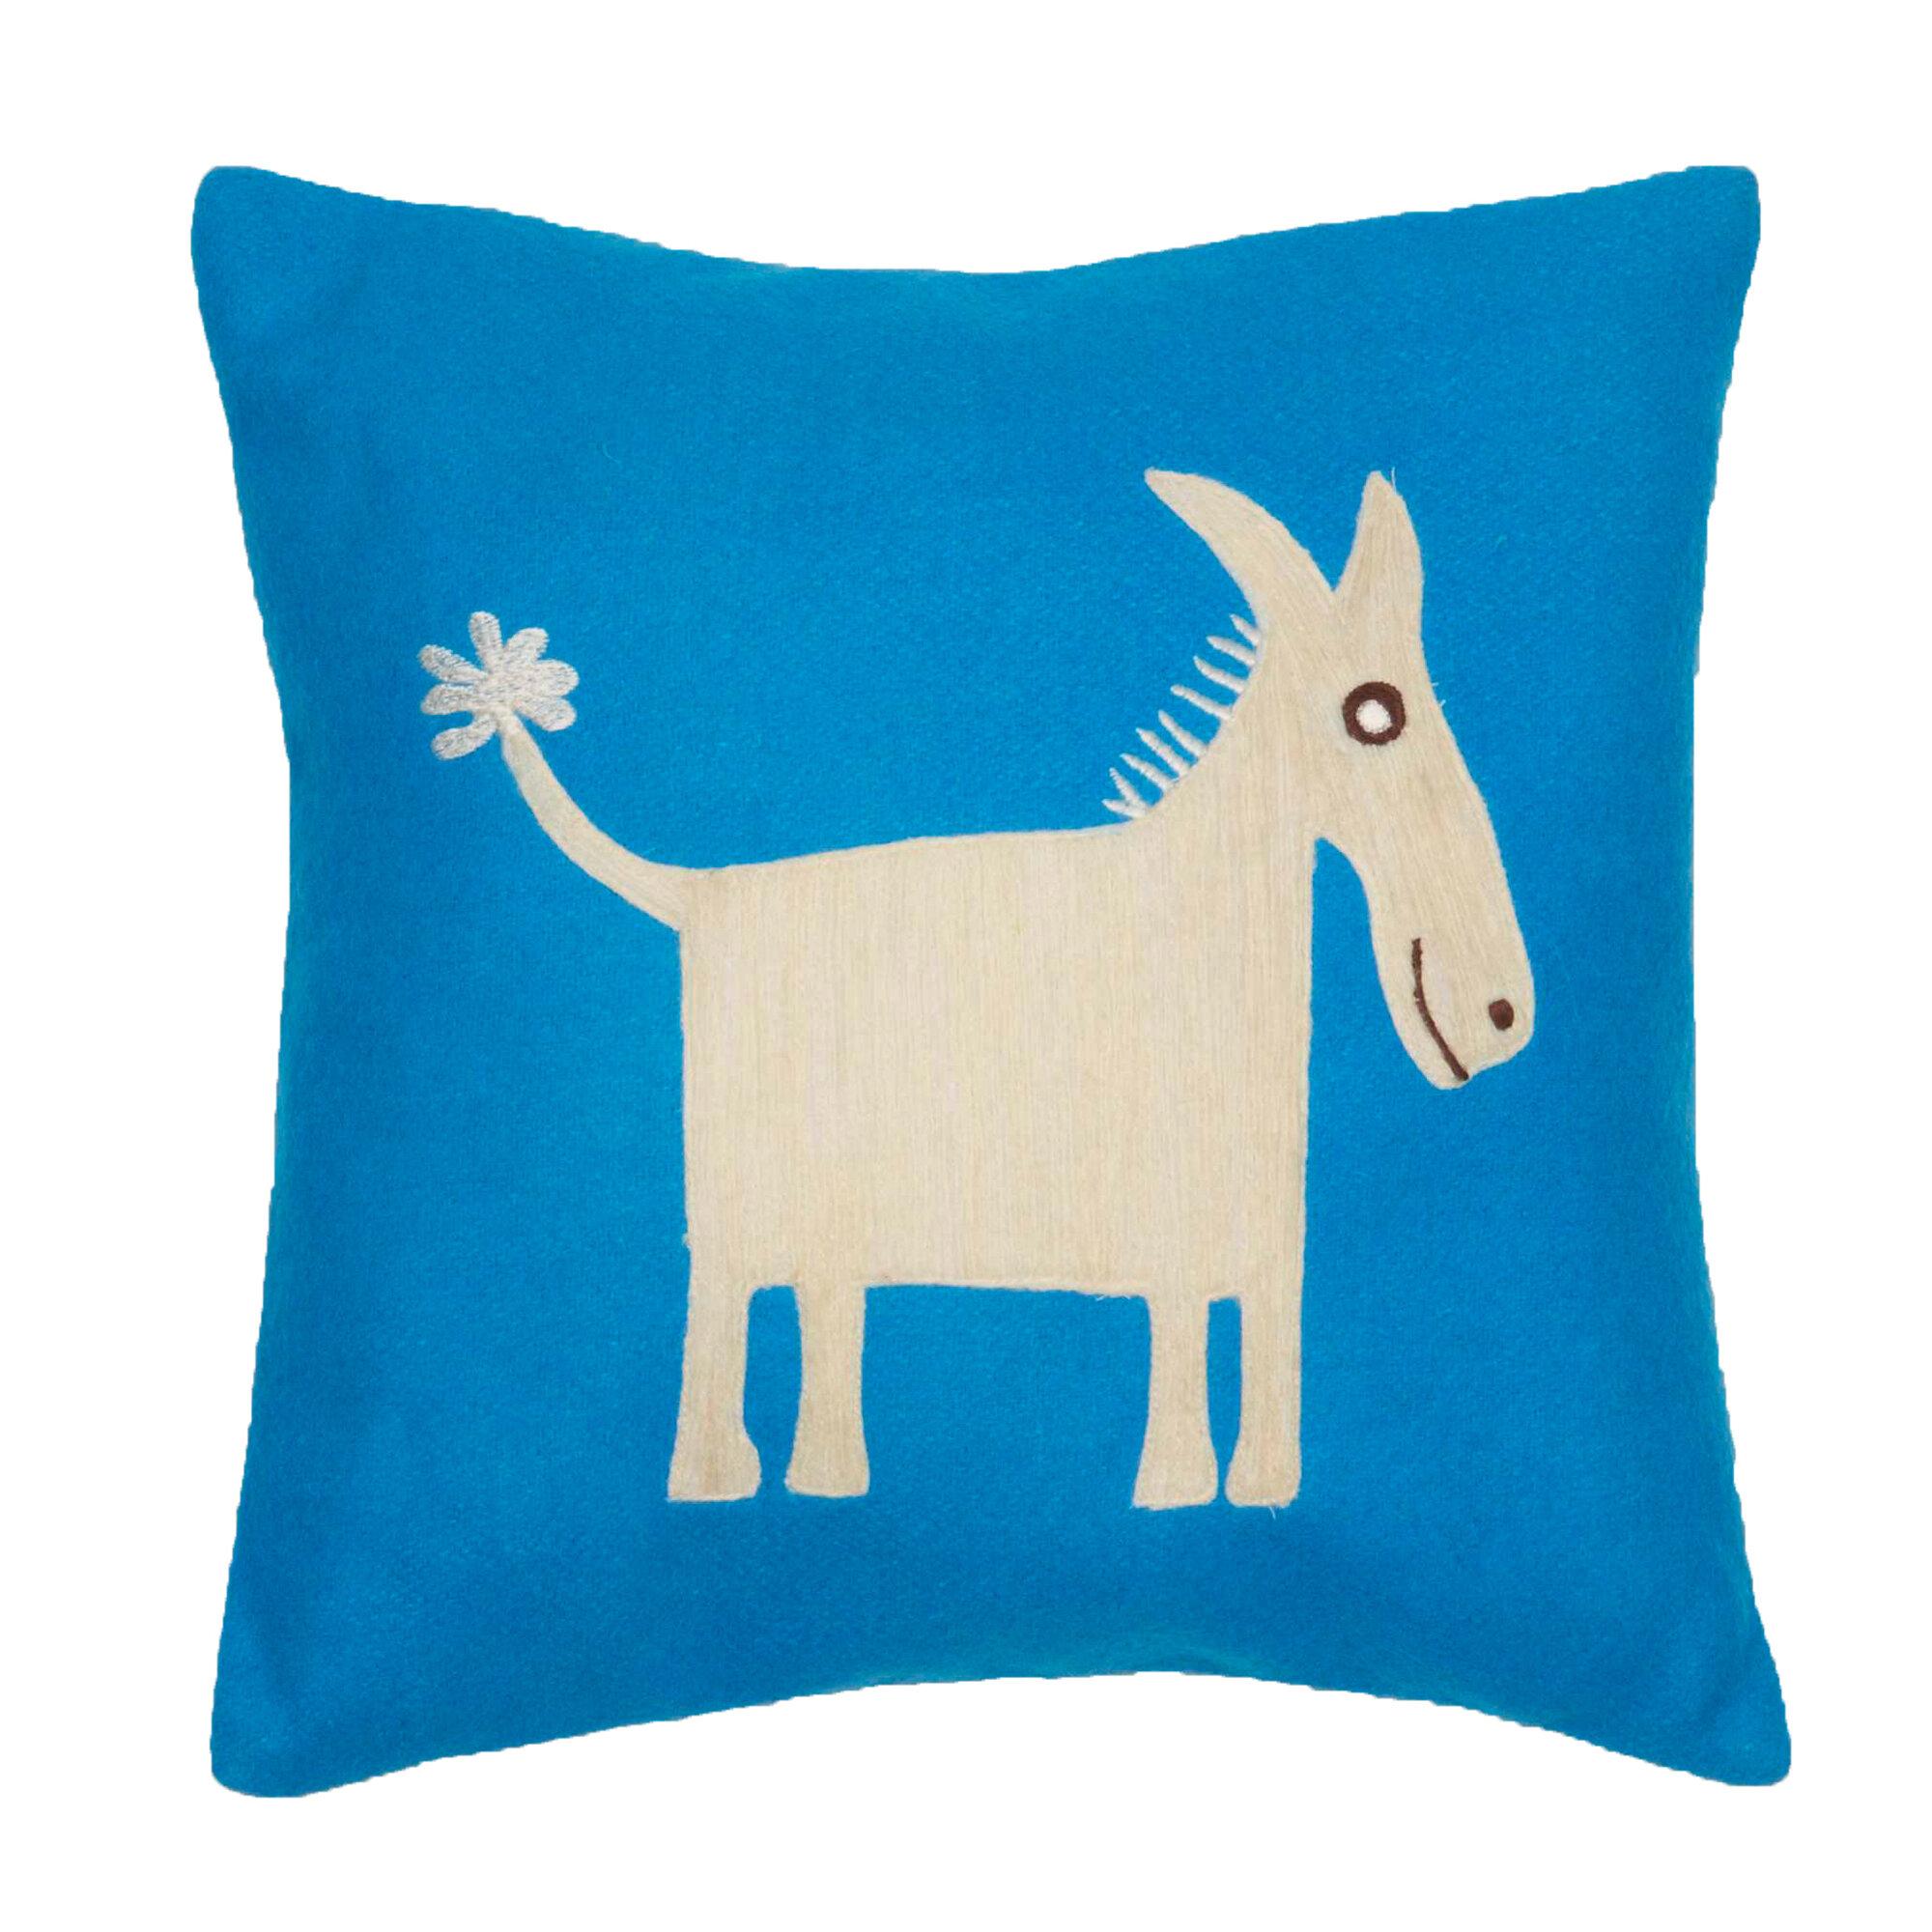 Animals Wildlife Amity Home Throw Pillows You Ll Love In 2021 Wayfair